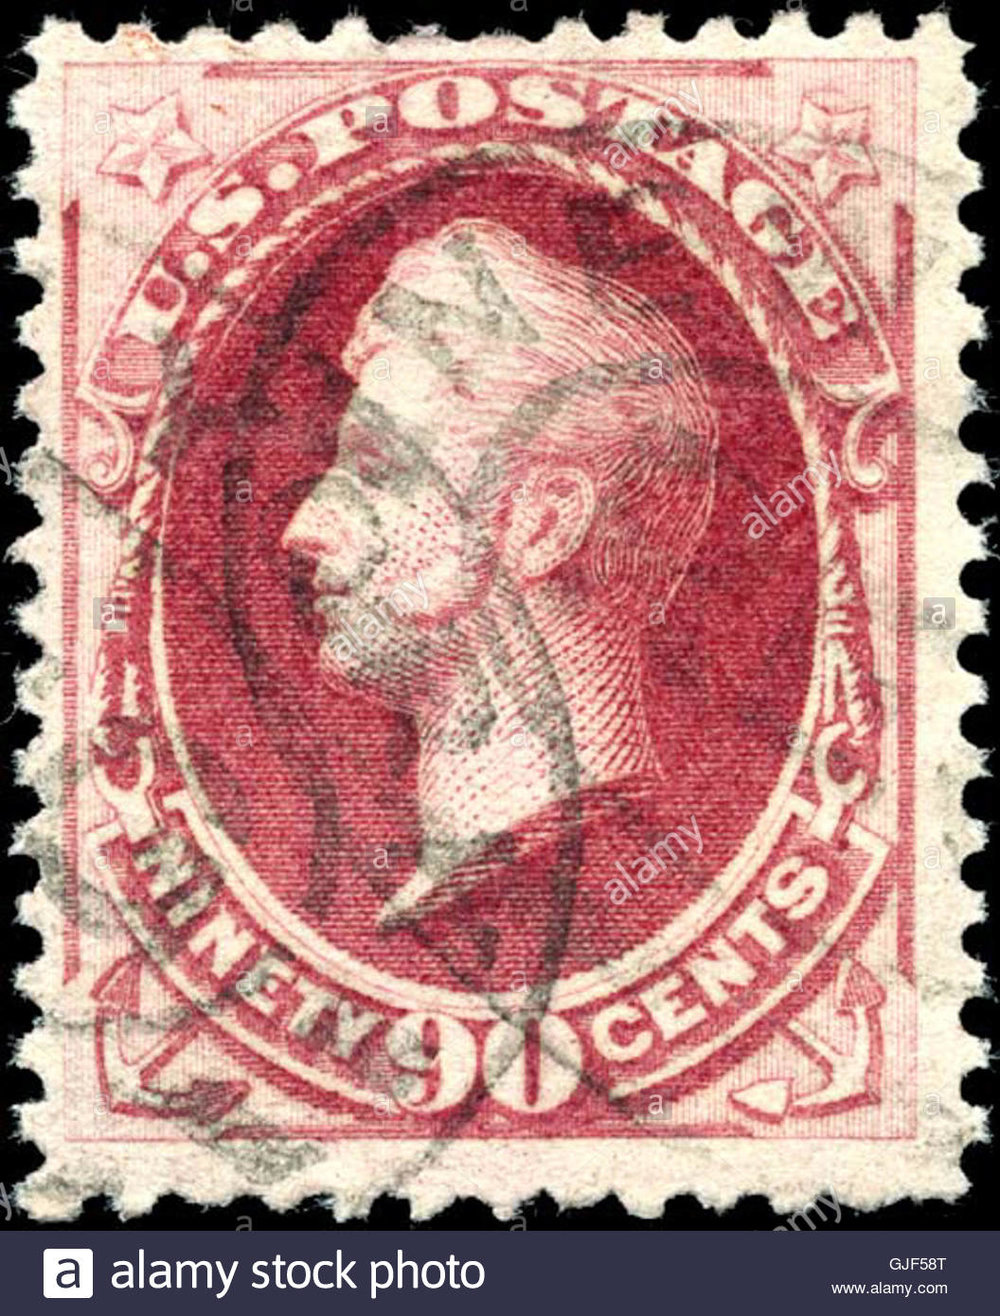 stamp-us-1879-90c-perry-GJF58T.jpg